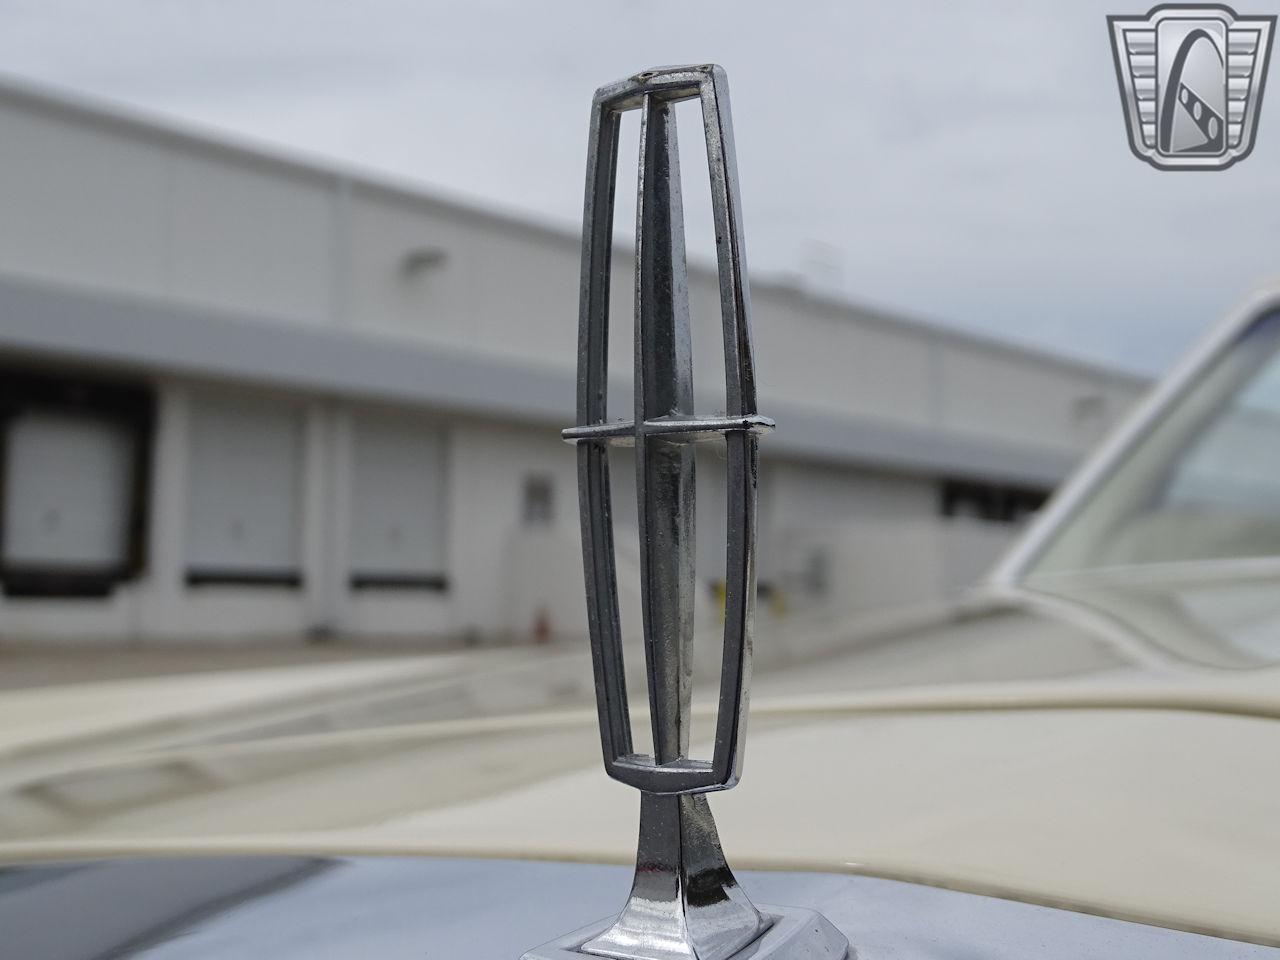 1983 Lincoln Continental 38